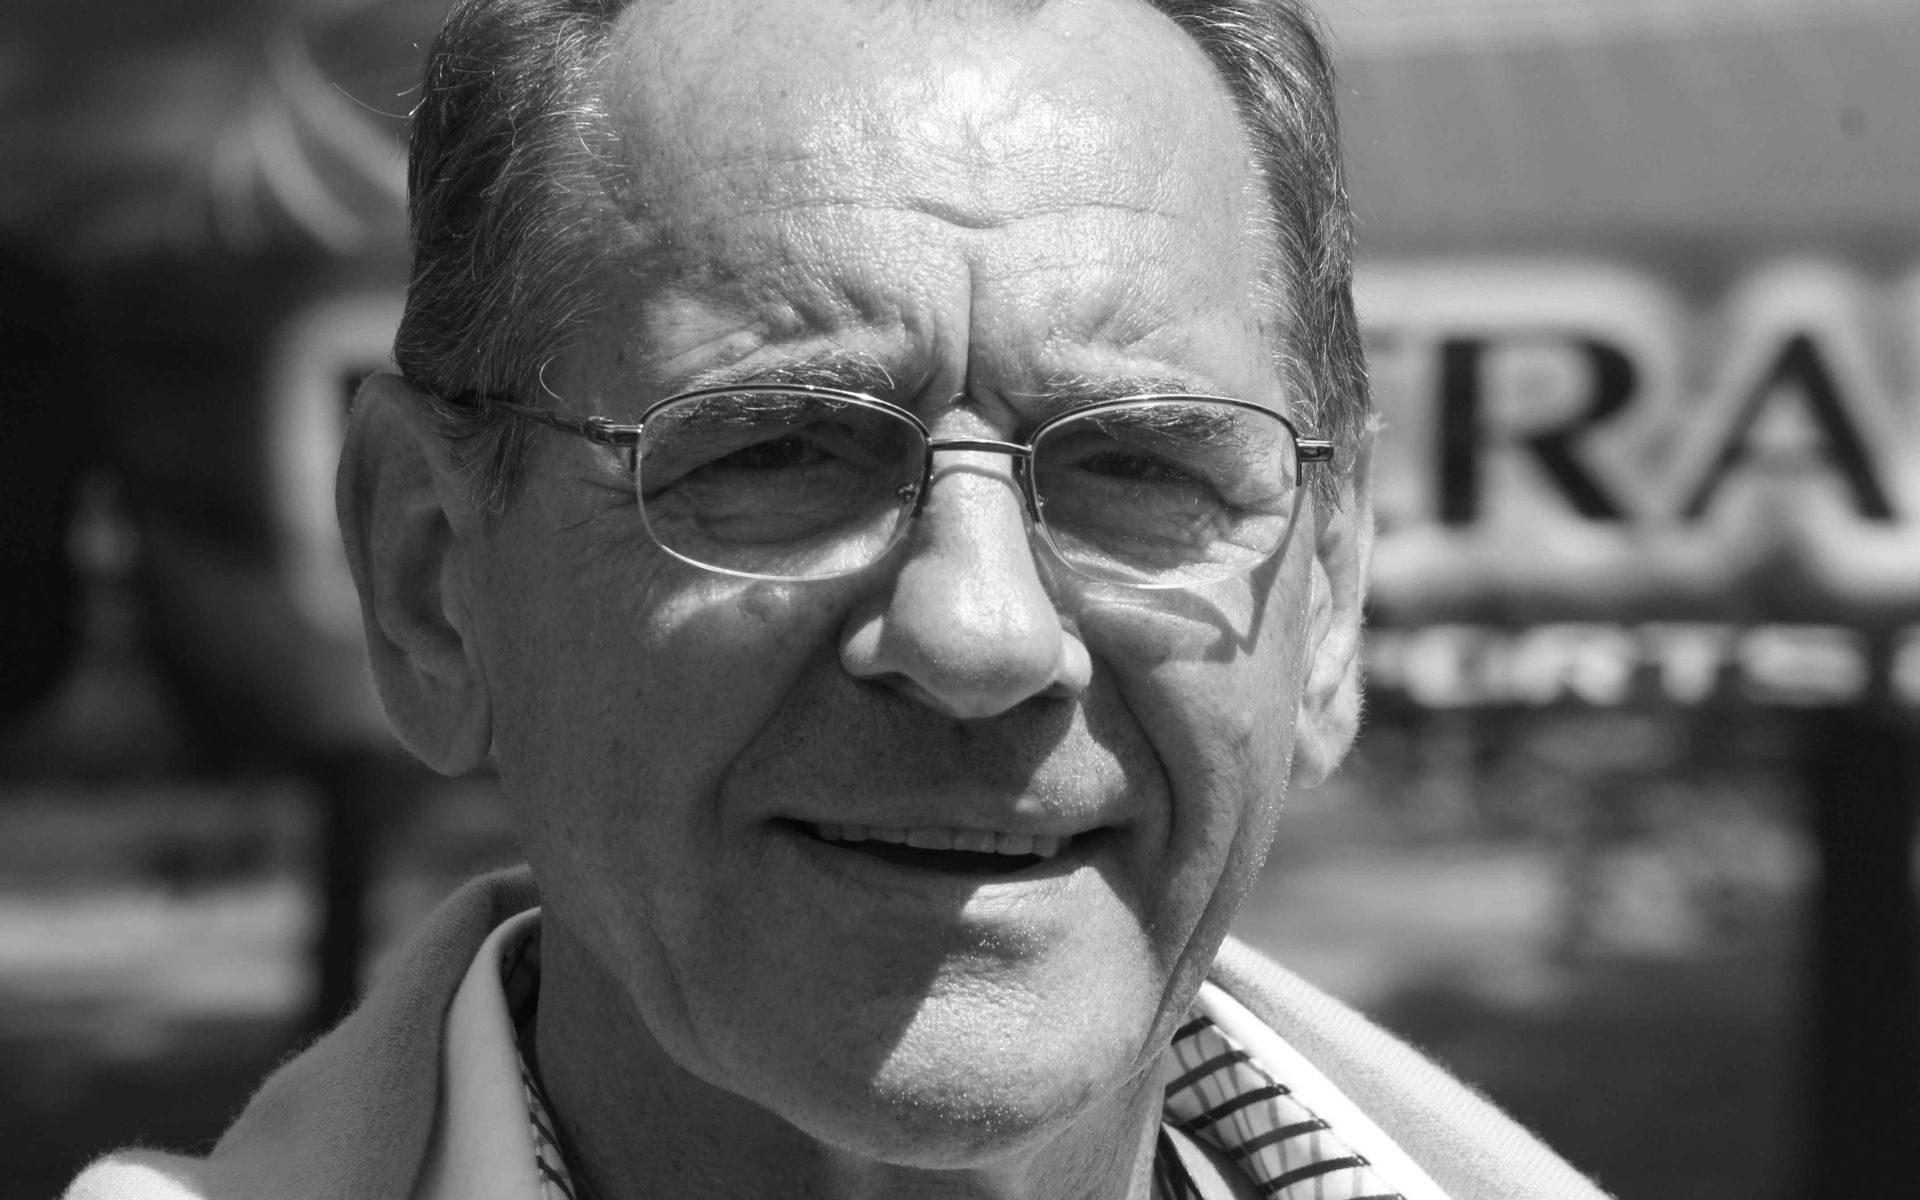 Ryszard Szurkowski